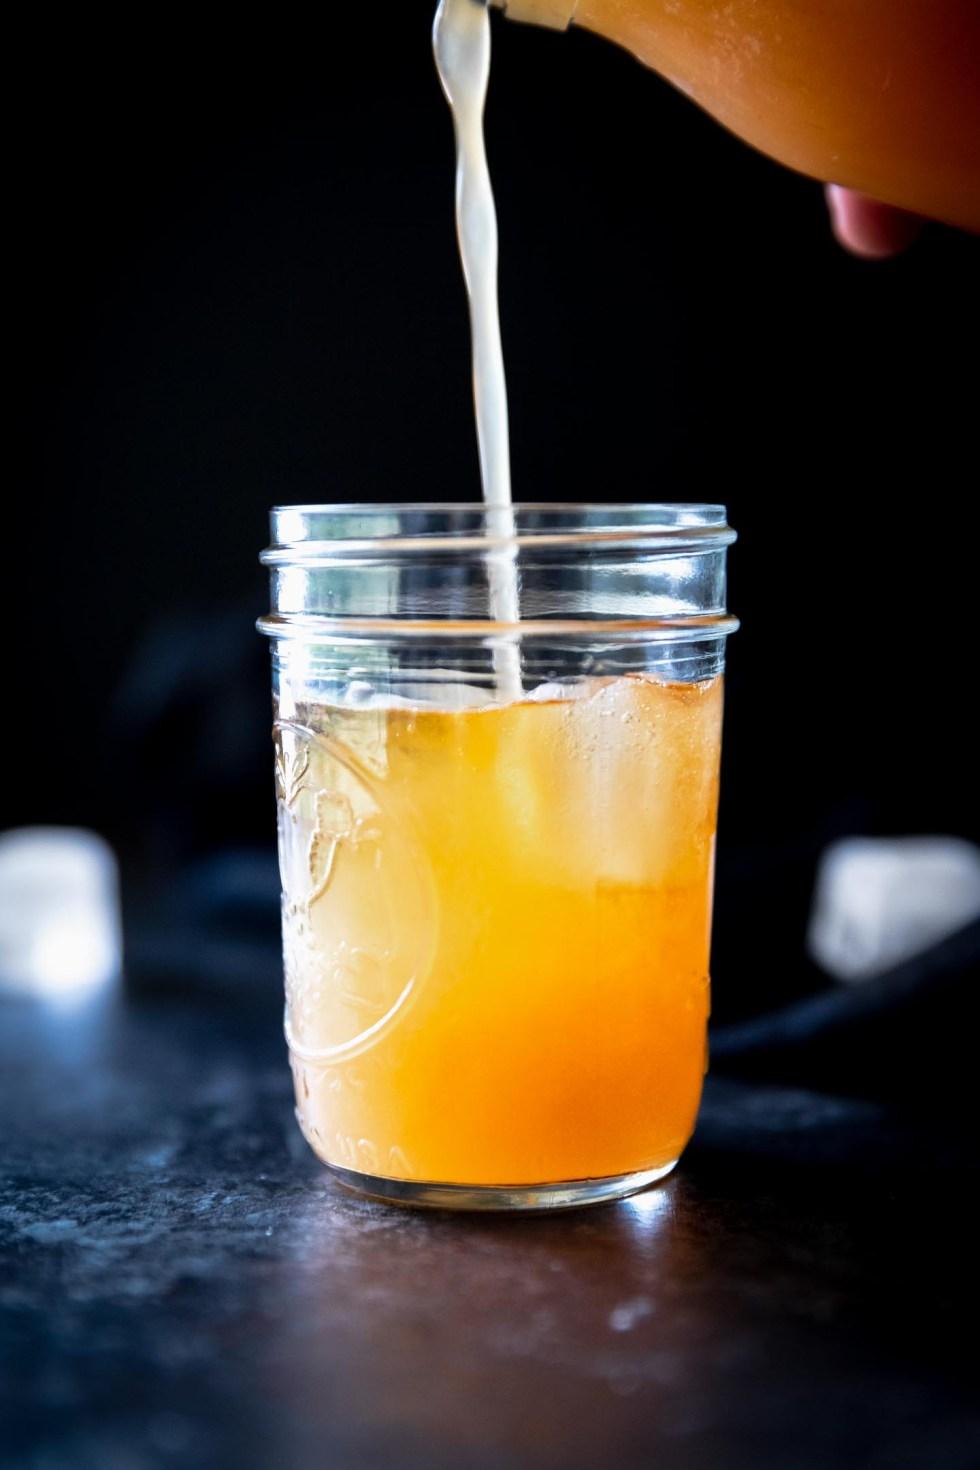 Mason jar with sun tea and added guava